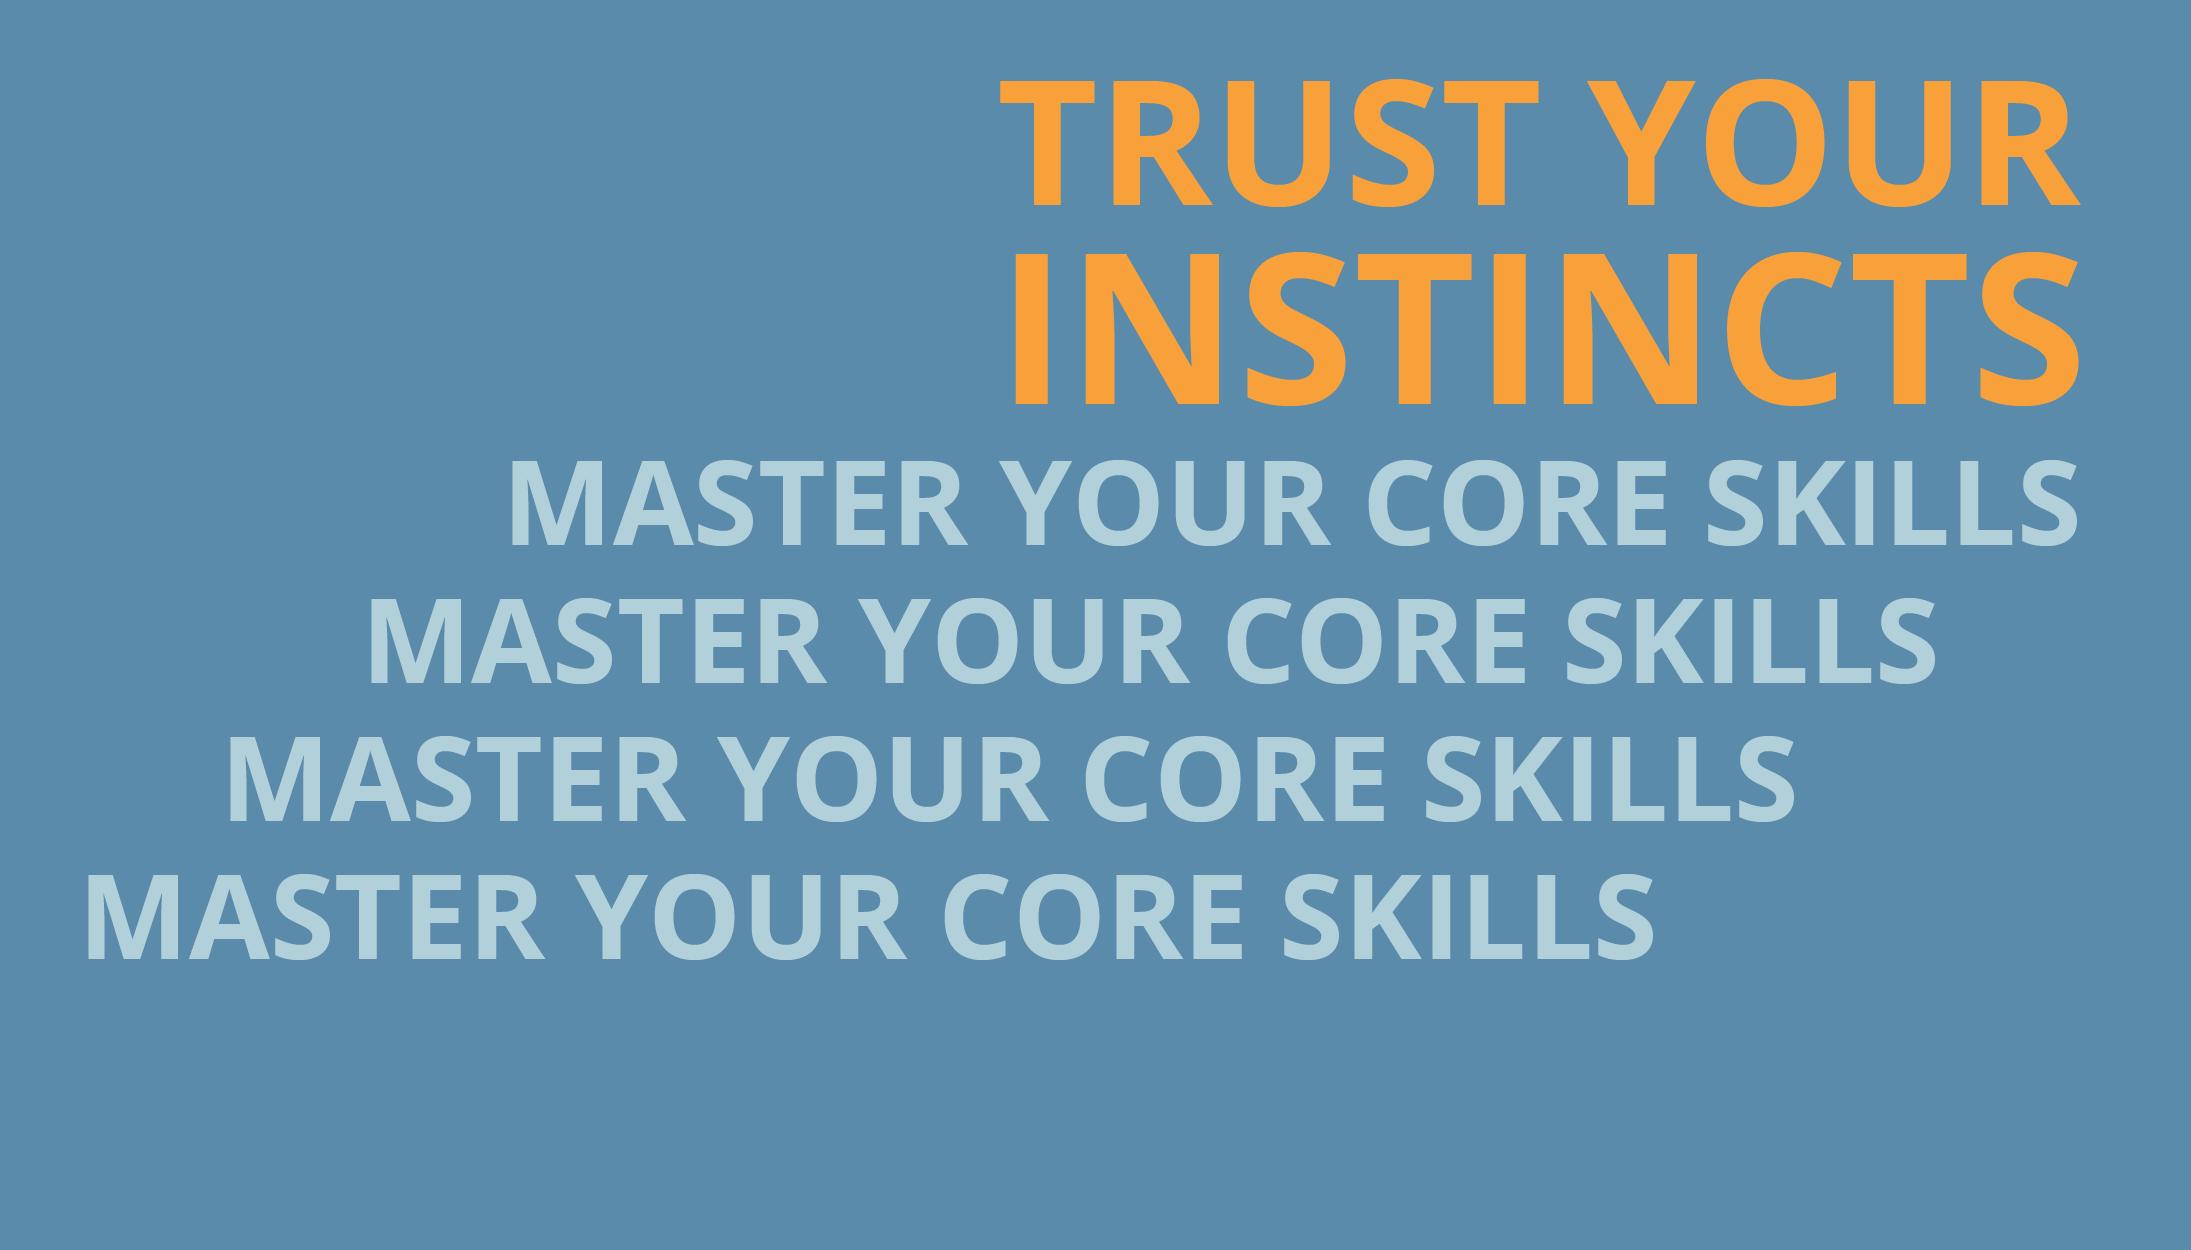 TRUST YOUR INSTINCTS